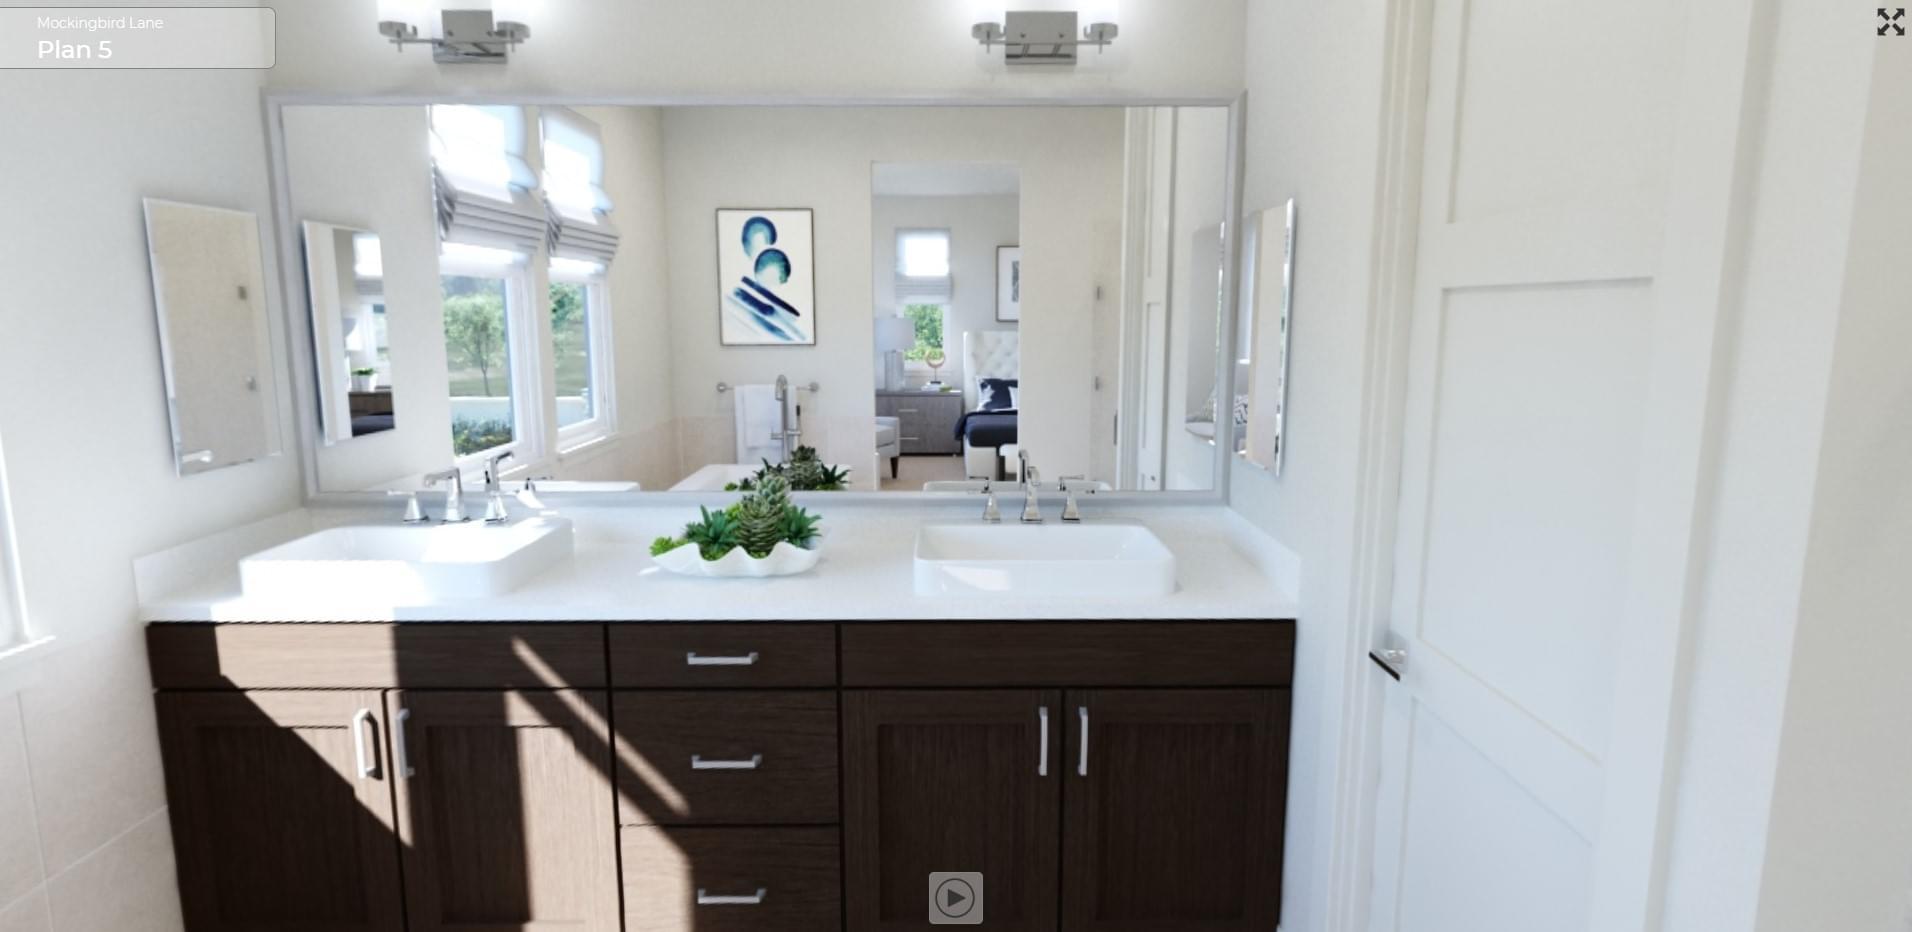 Residence 5 Master Bath